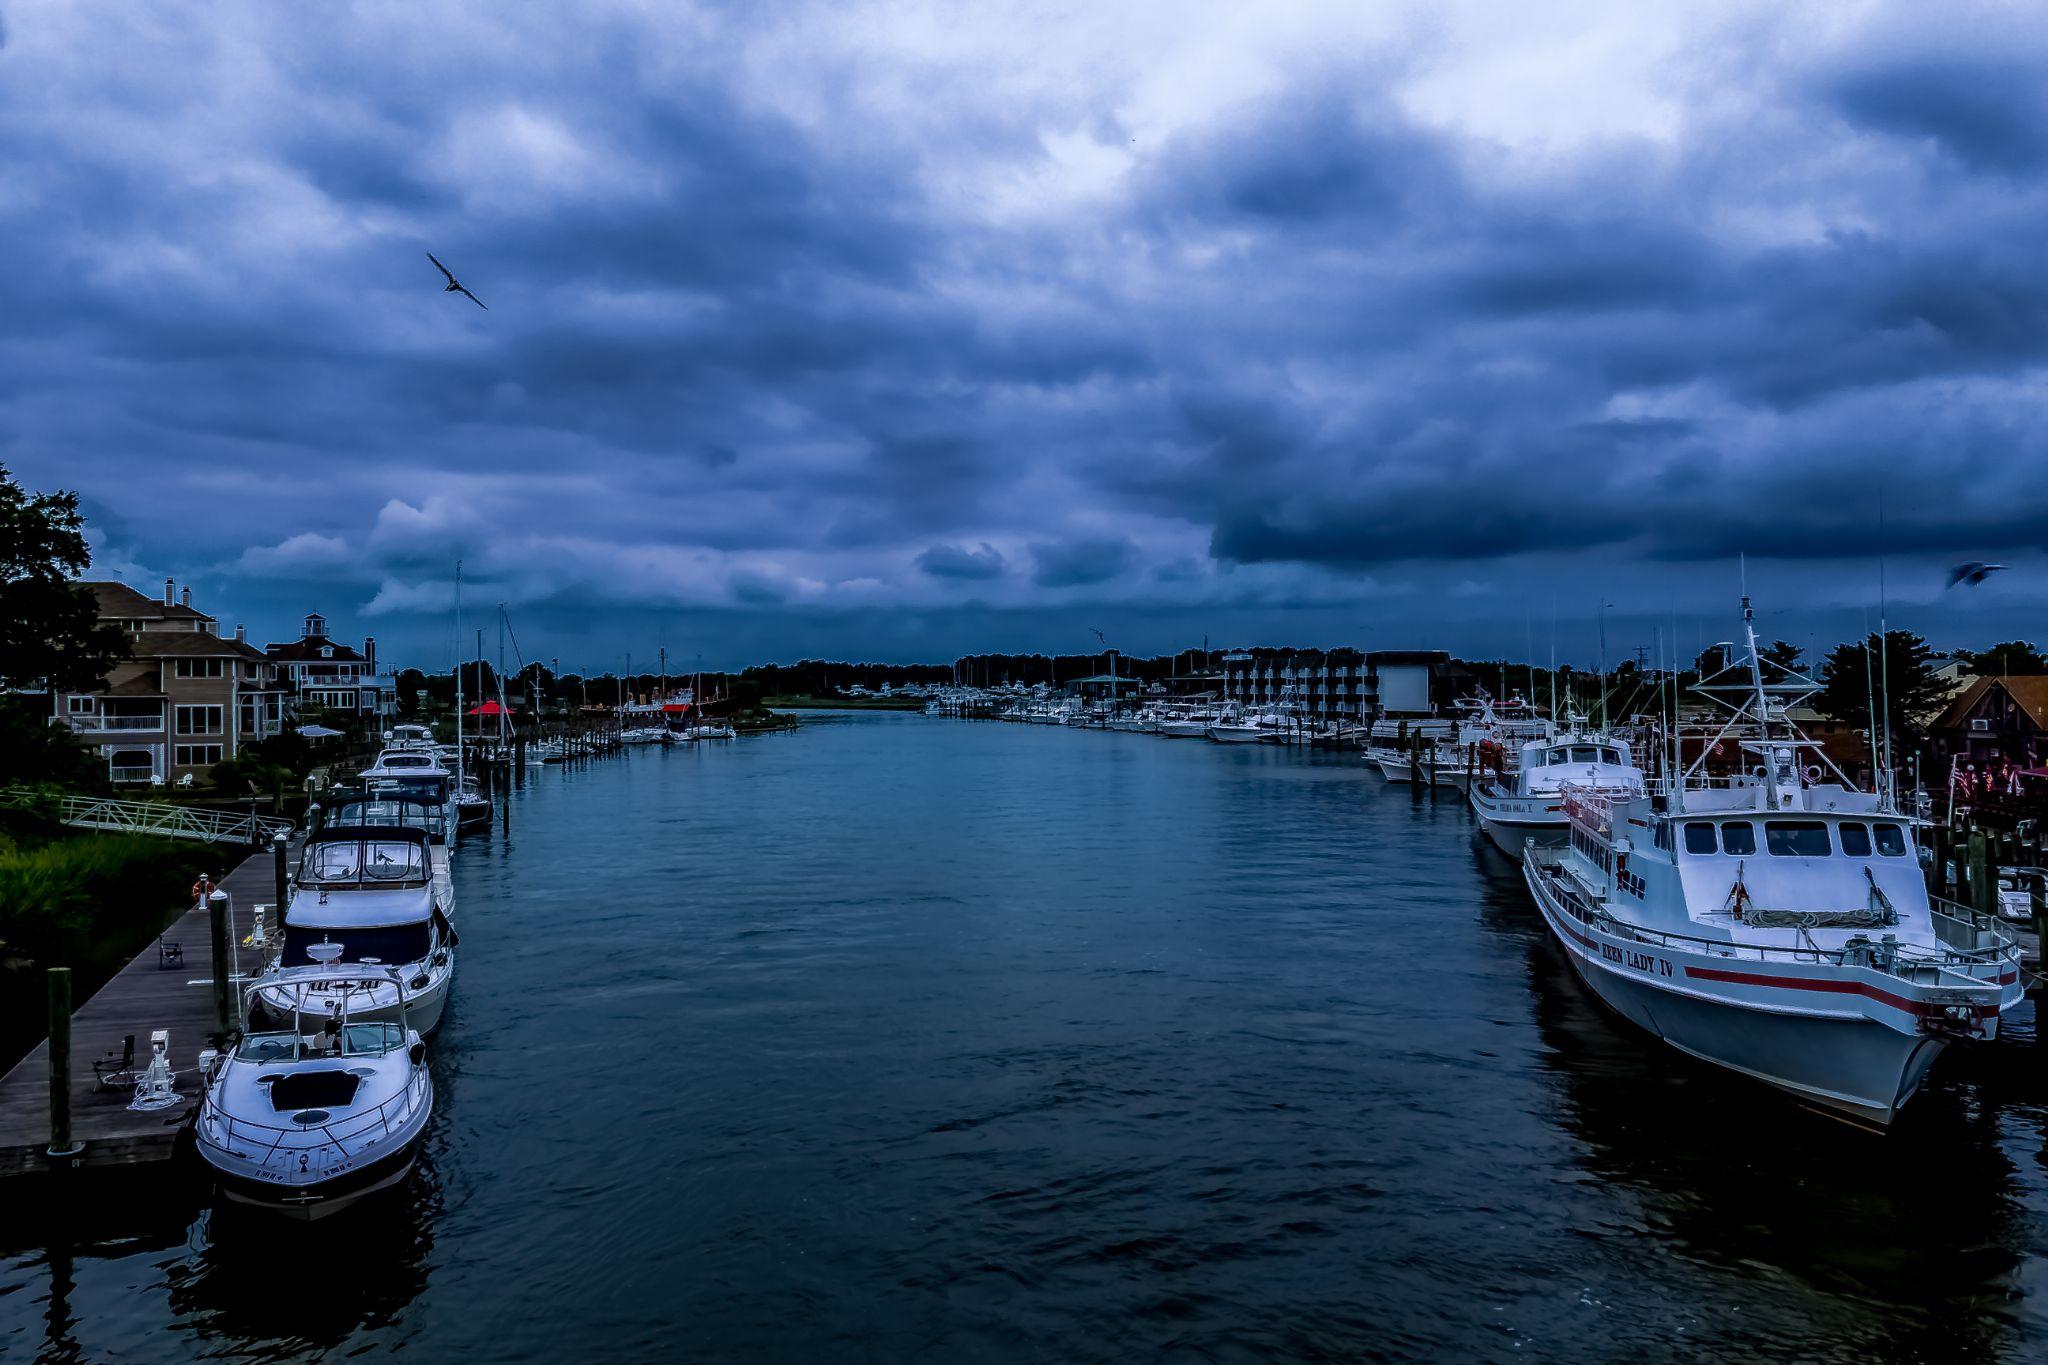 Overcast Day by Advenini